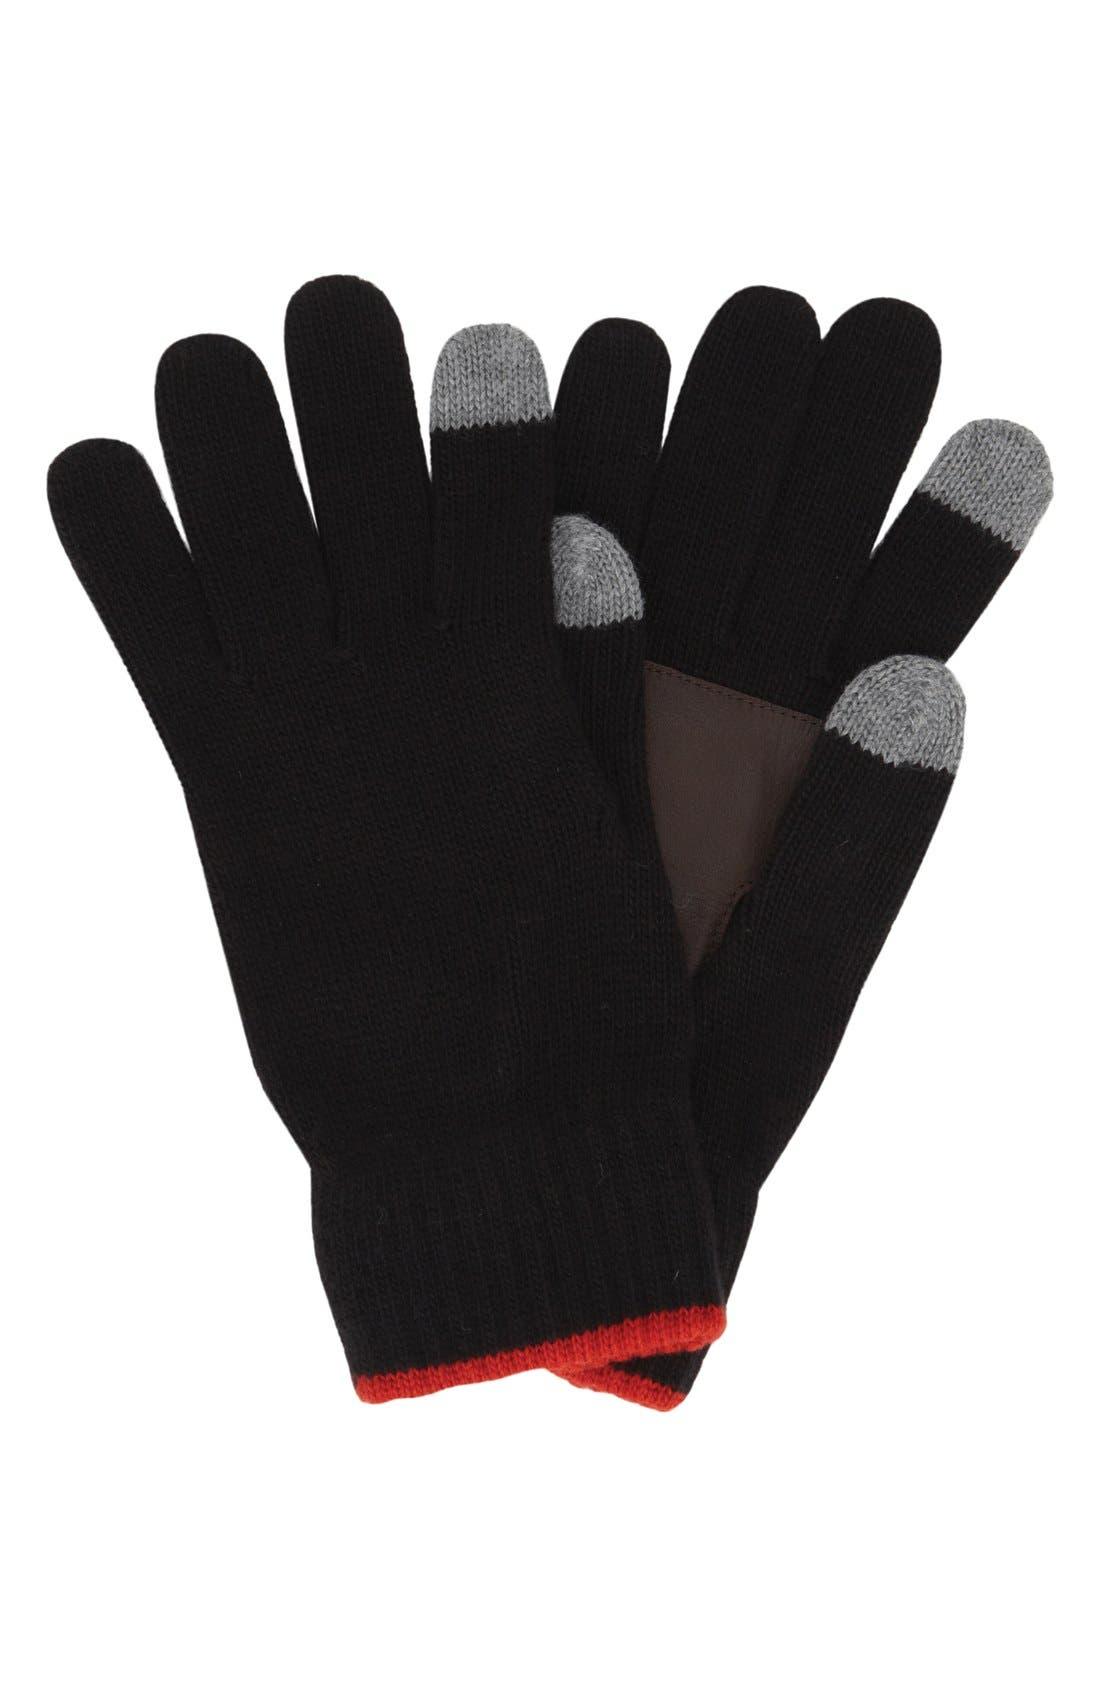 Main Image - Original Penguin 'Bordwell' Knit Gloves